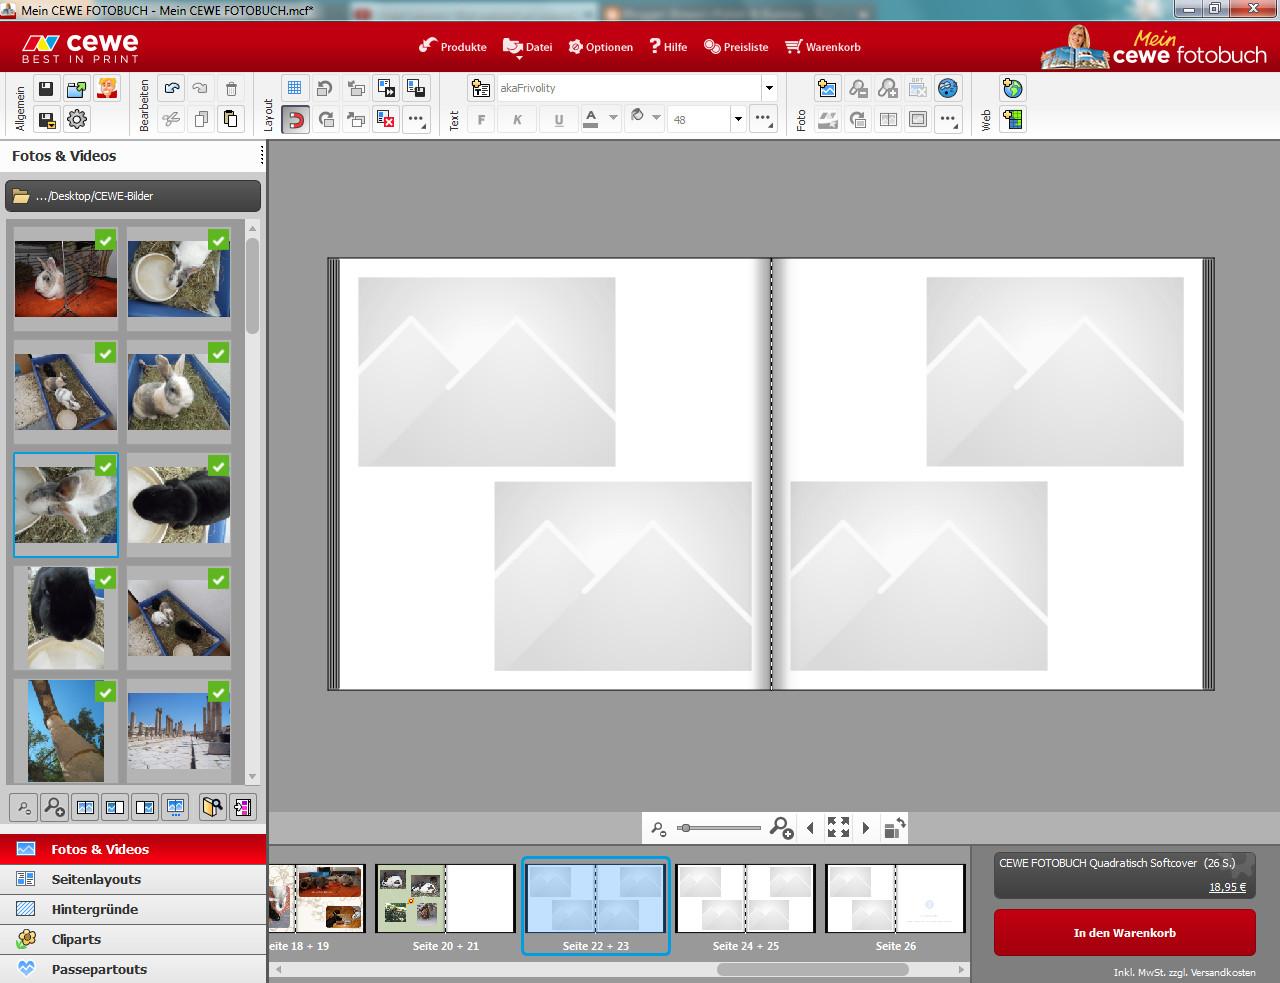 binara s polish bunnies werbung mein cewe fotobuch. Black Bedroom Furniture Sets. Home Design Ideas